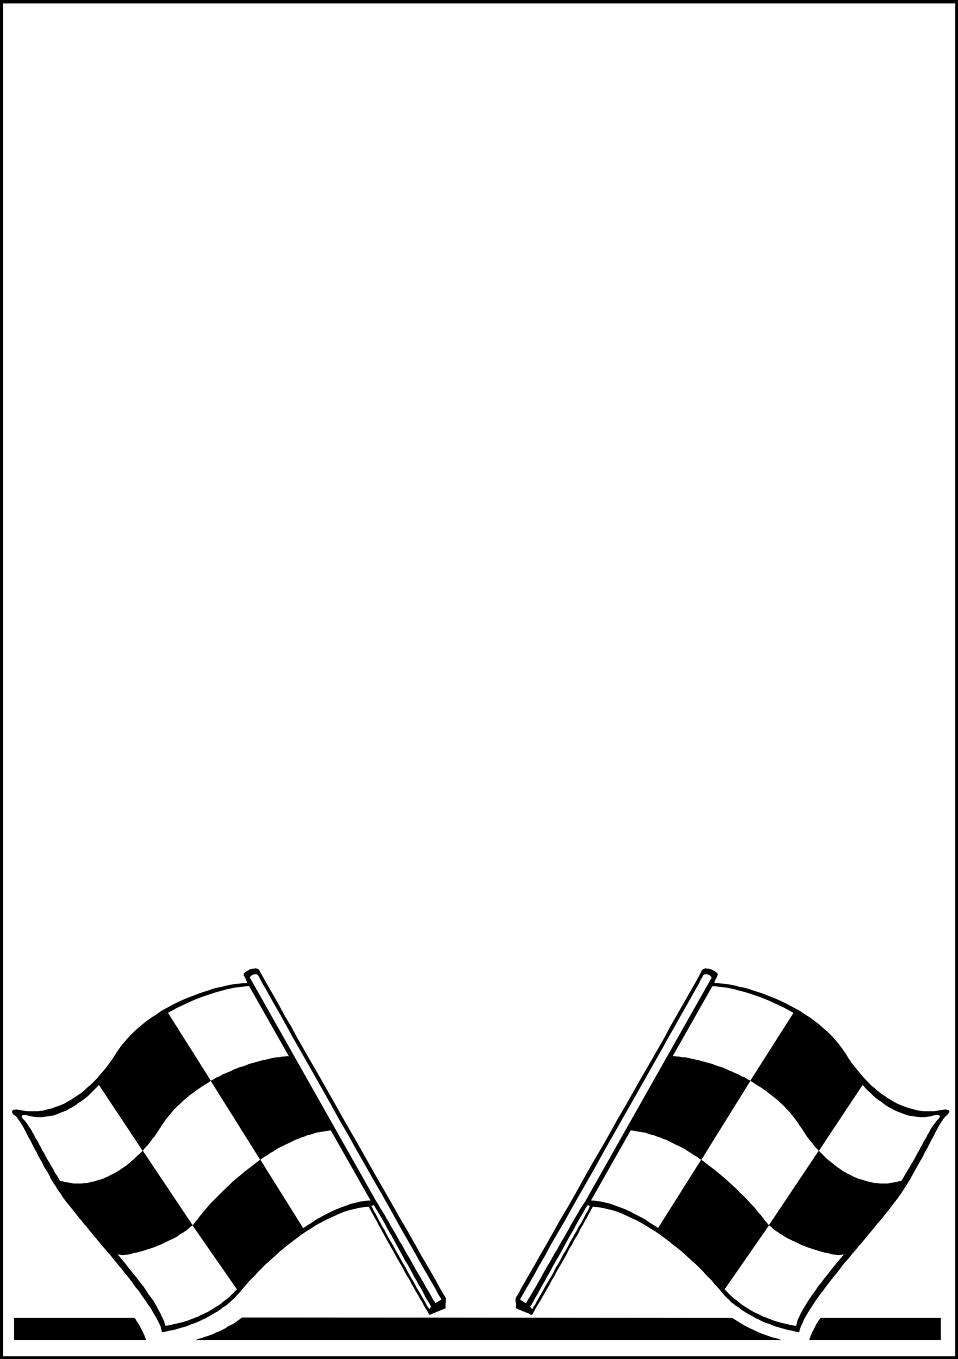 Similiar Black Race Car Border Keywords.